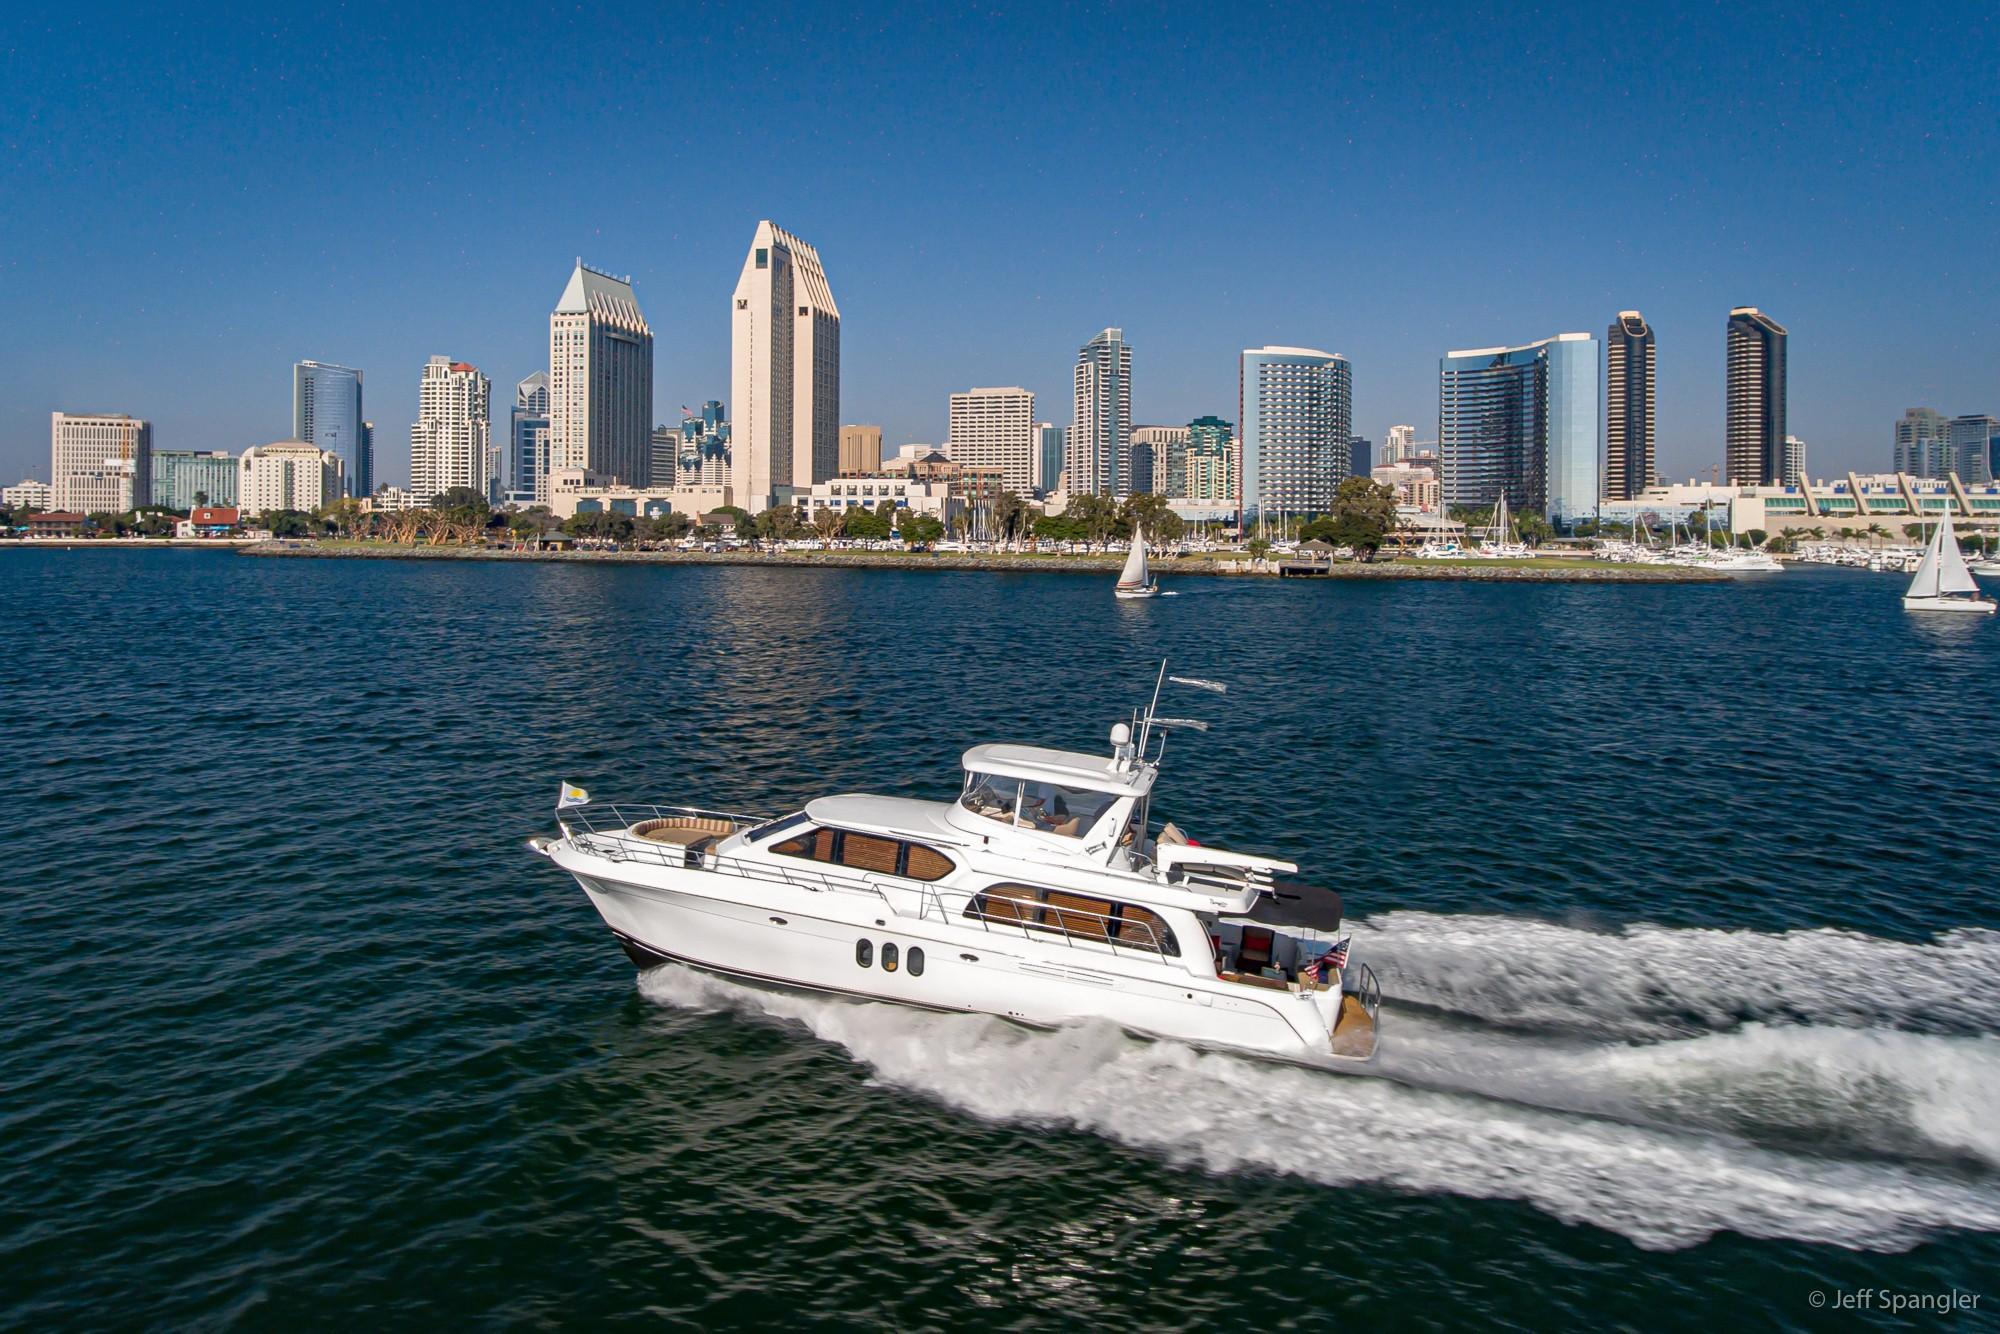 2008 Navigator 62 #TB6200WM inventory image at Sun Country Coastal in San Diego